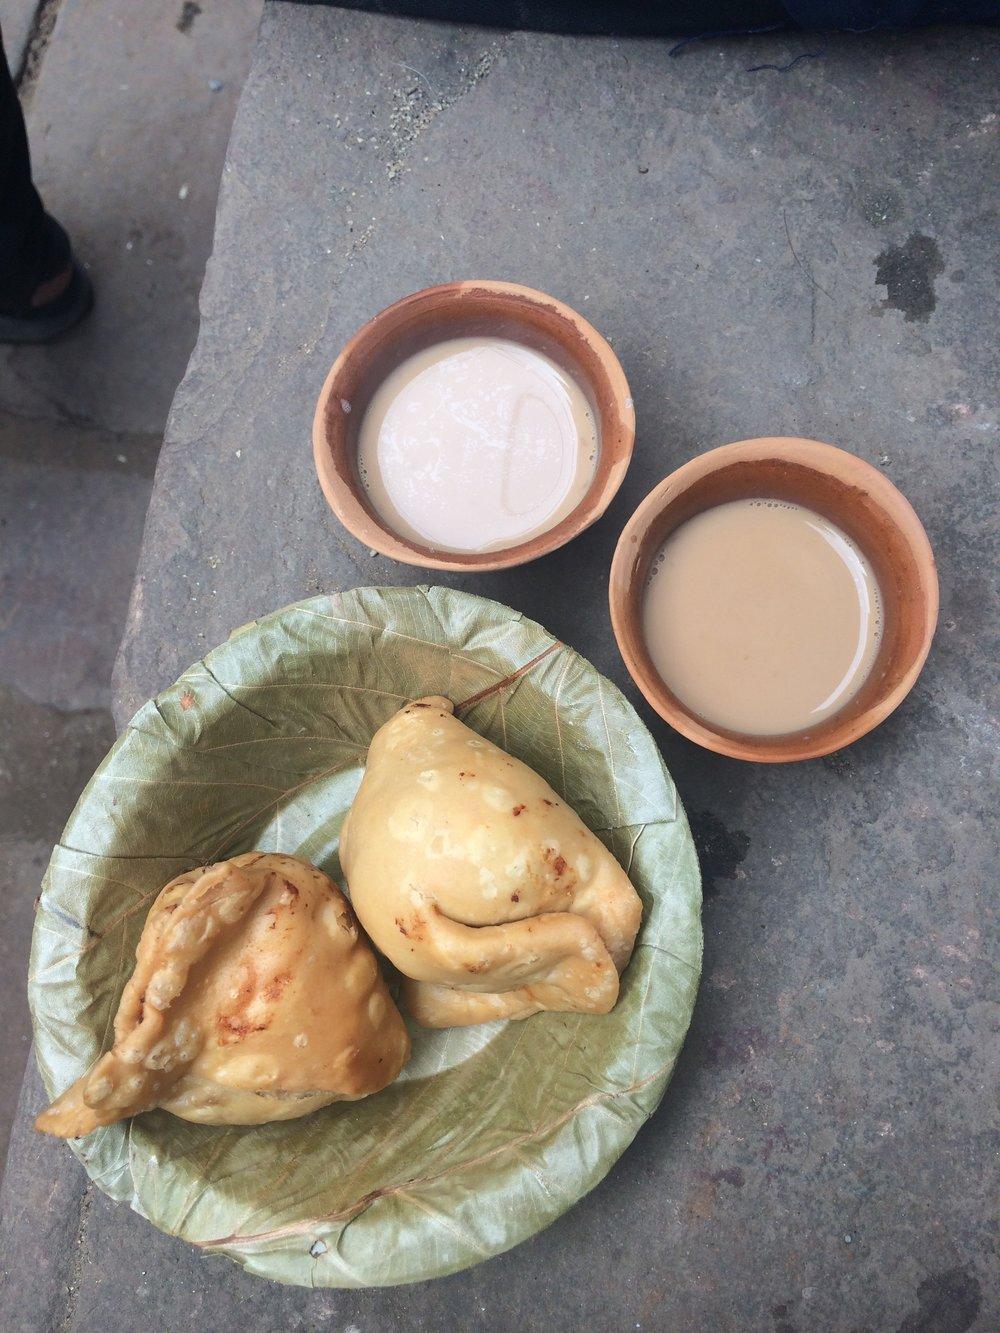 Samosa and chai break in Varanasi. Note: packaging made from natural materials